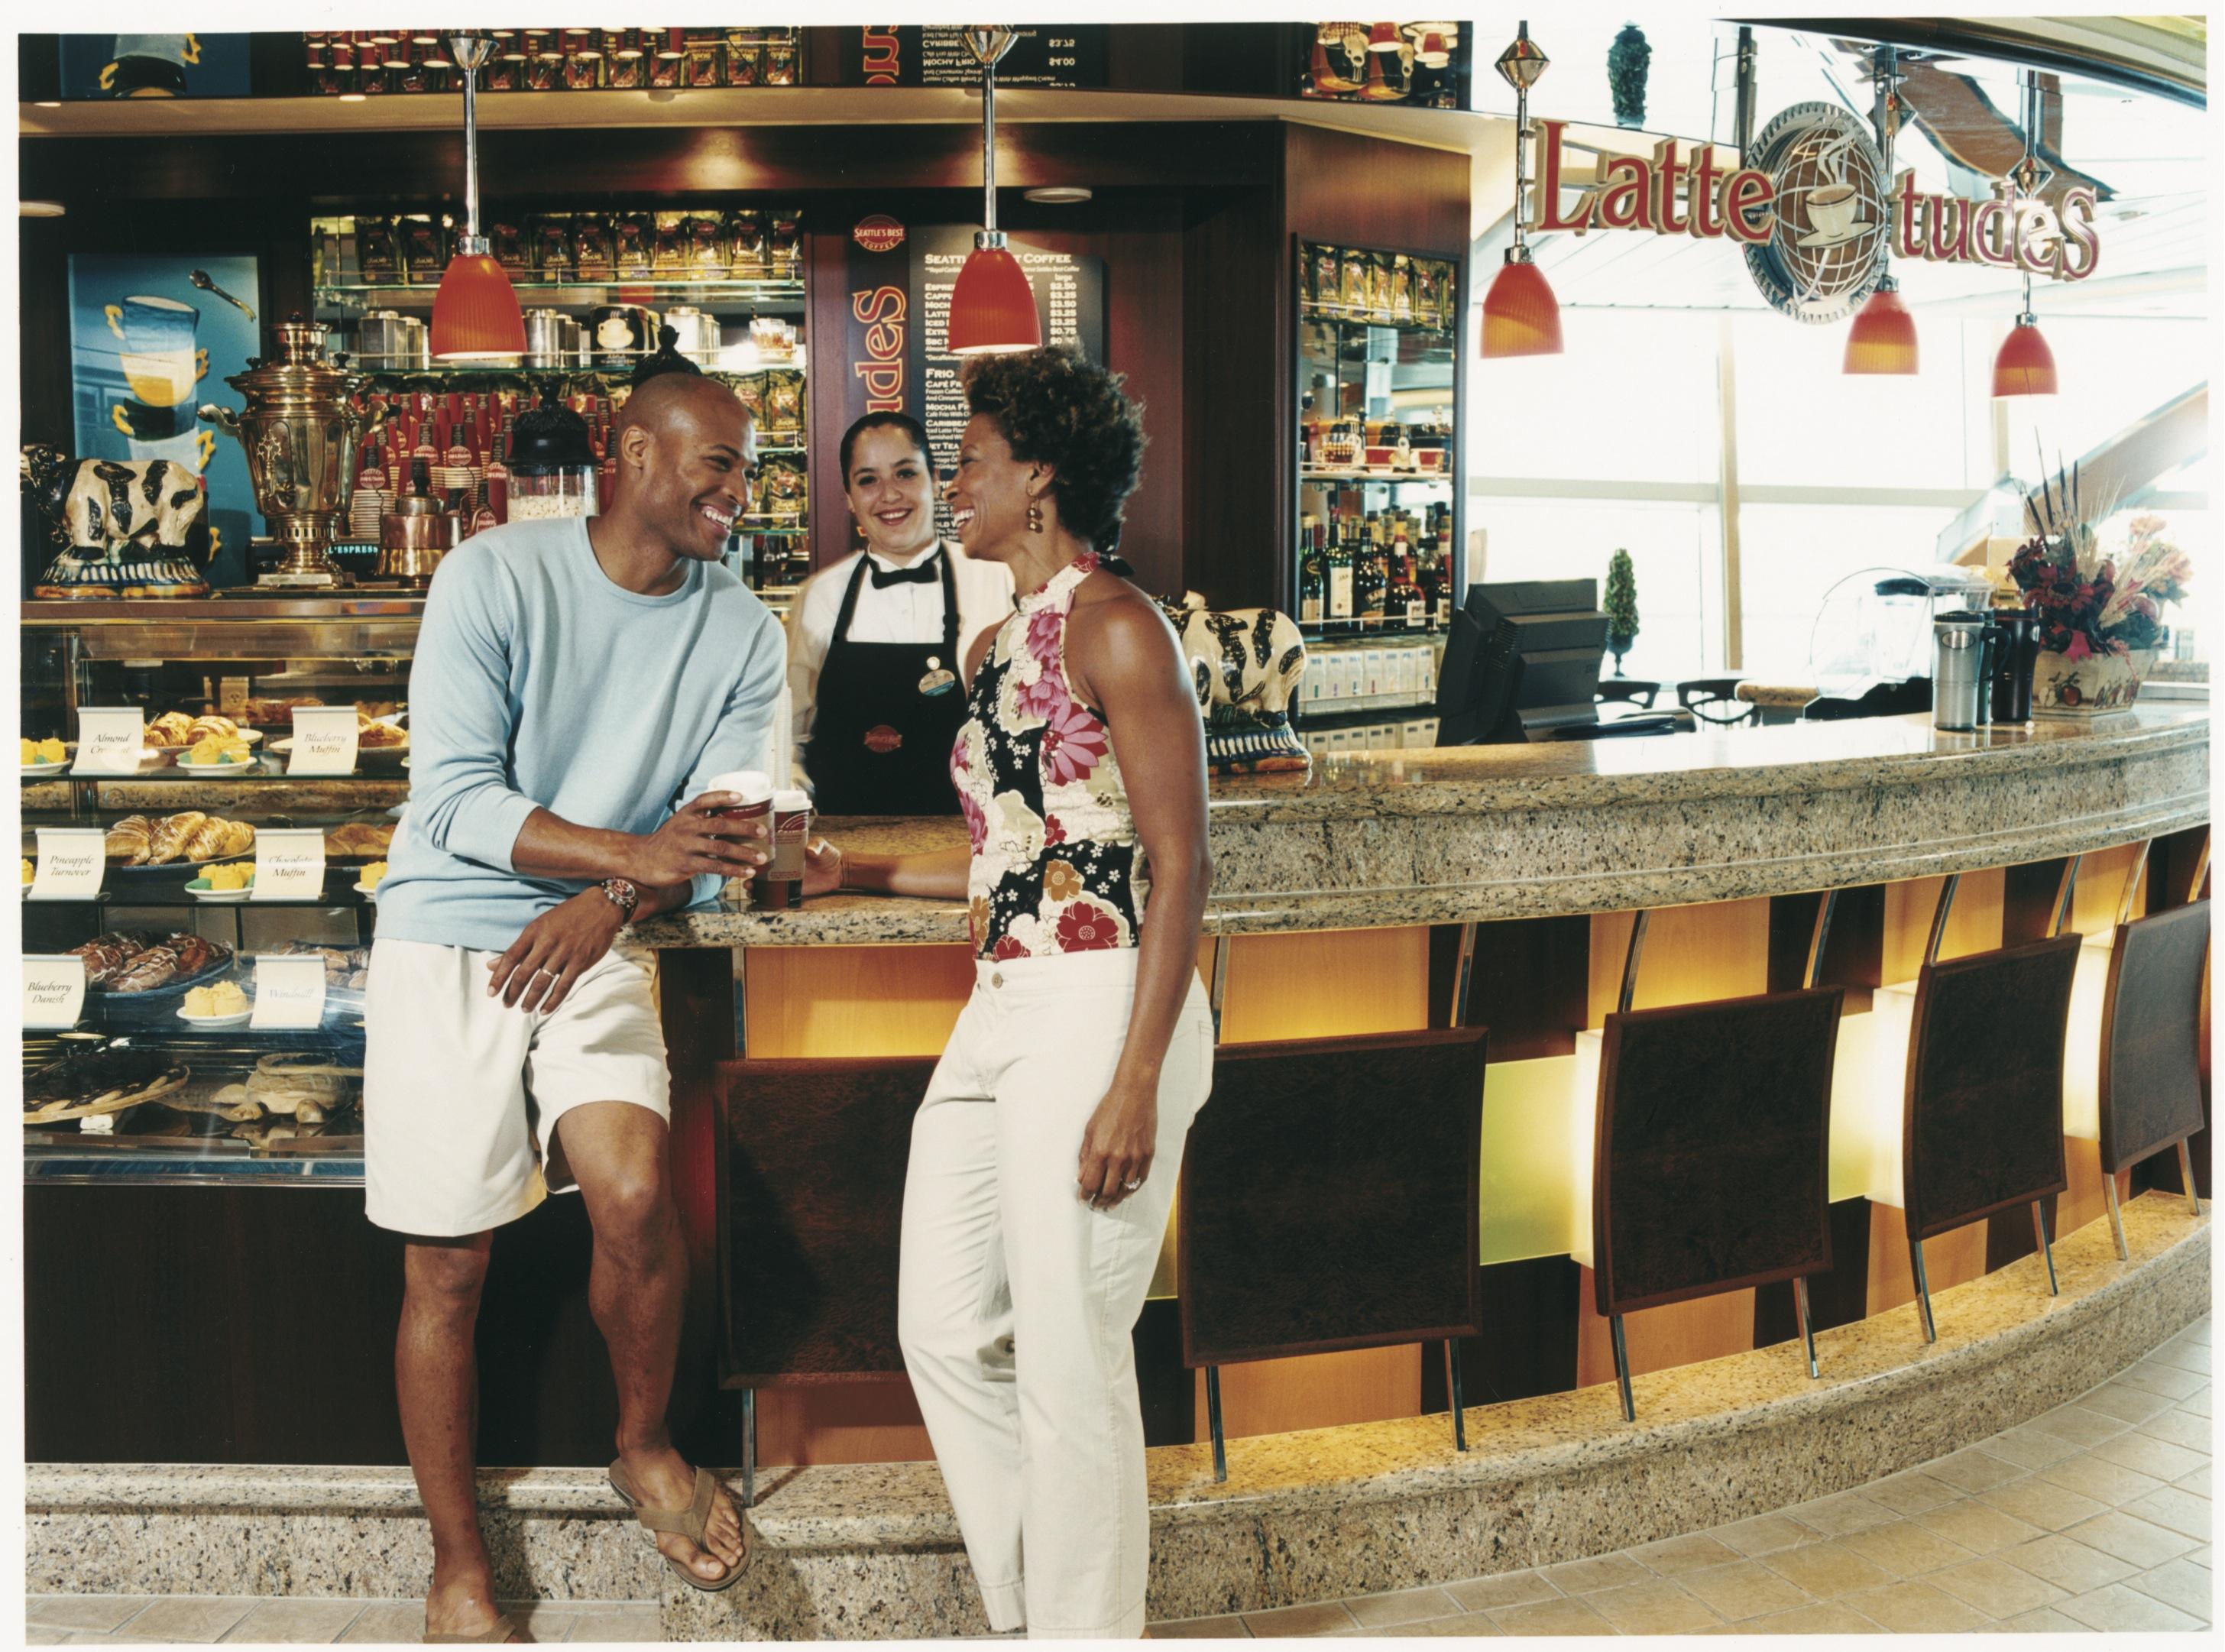 Royal Caribbean International Jewel of the Seas Interior LatteTudes 3.jpeg